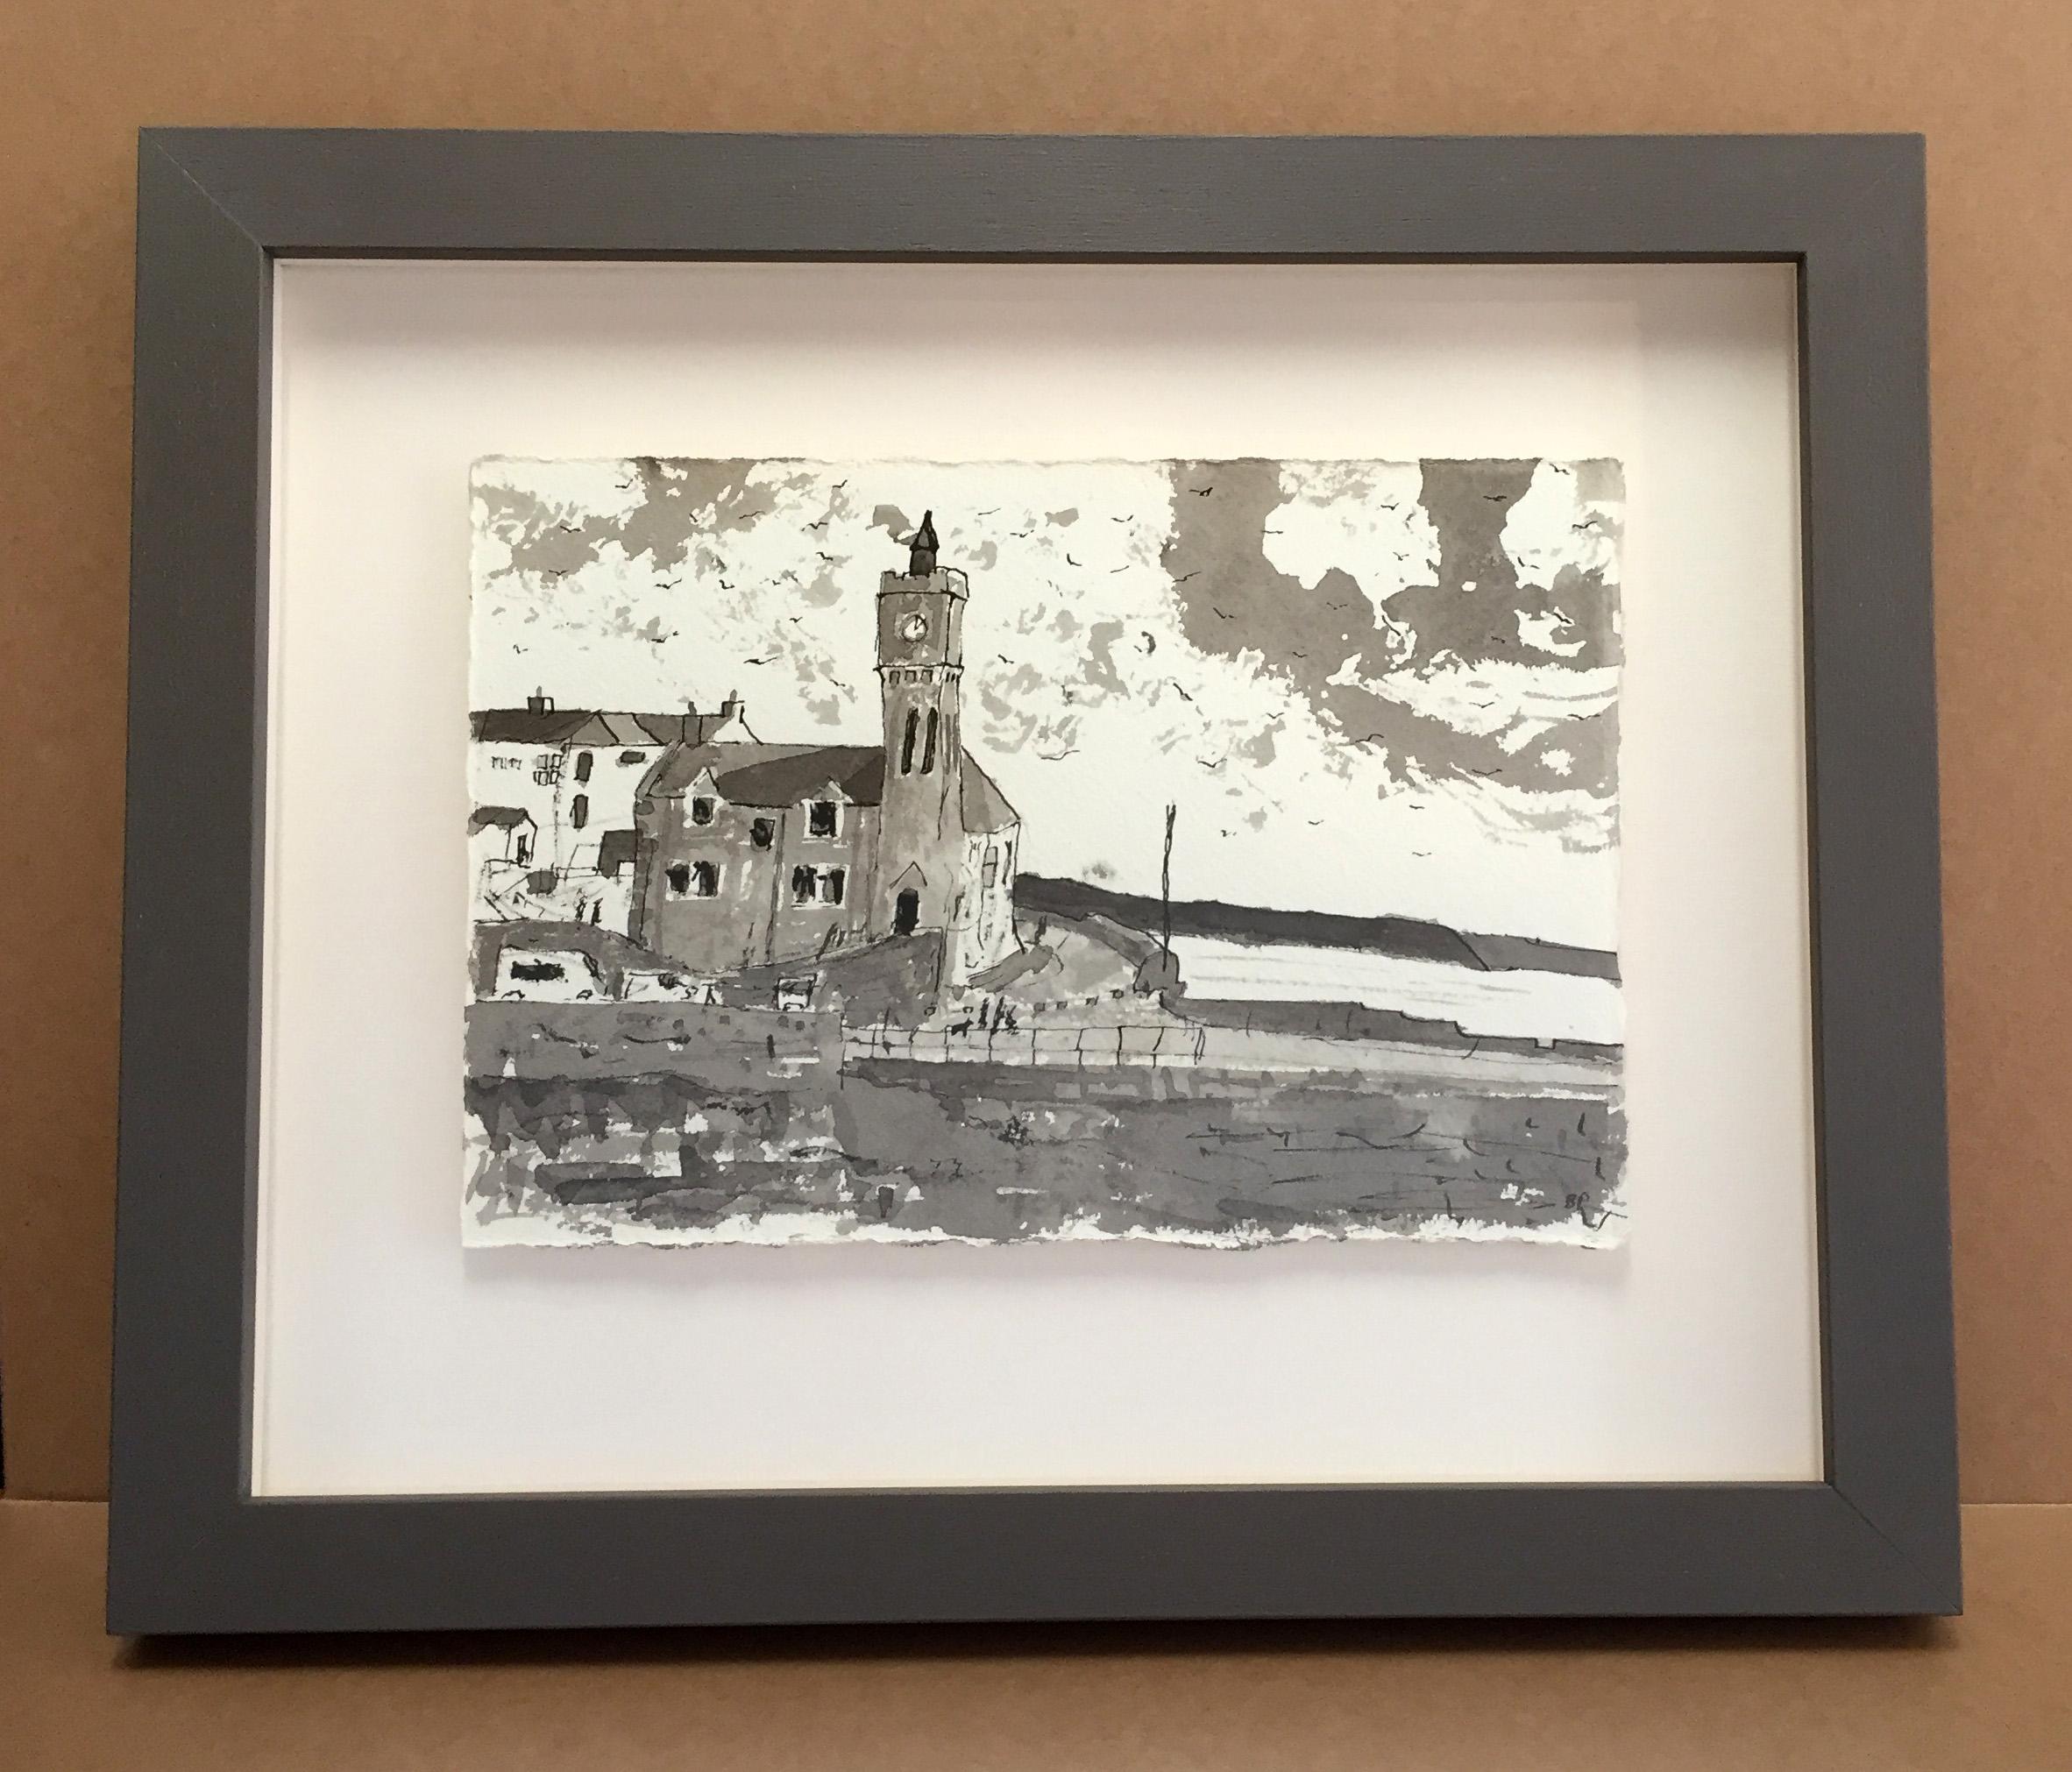 Framing - Customs House Gallery - Porthleven